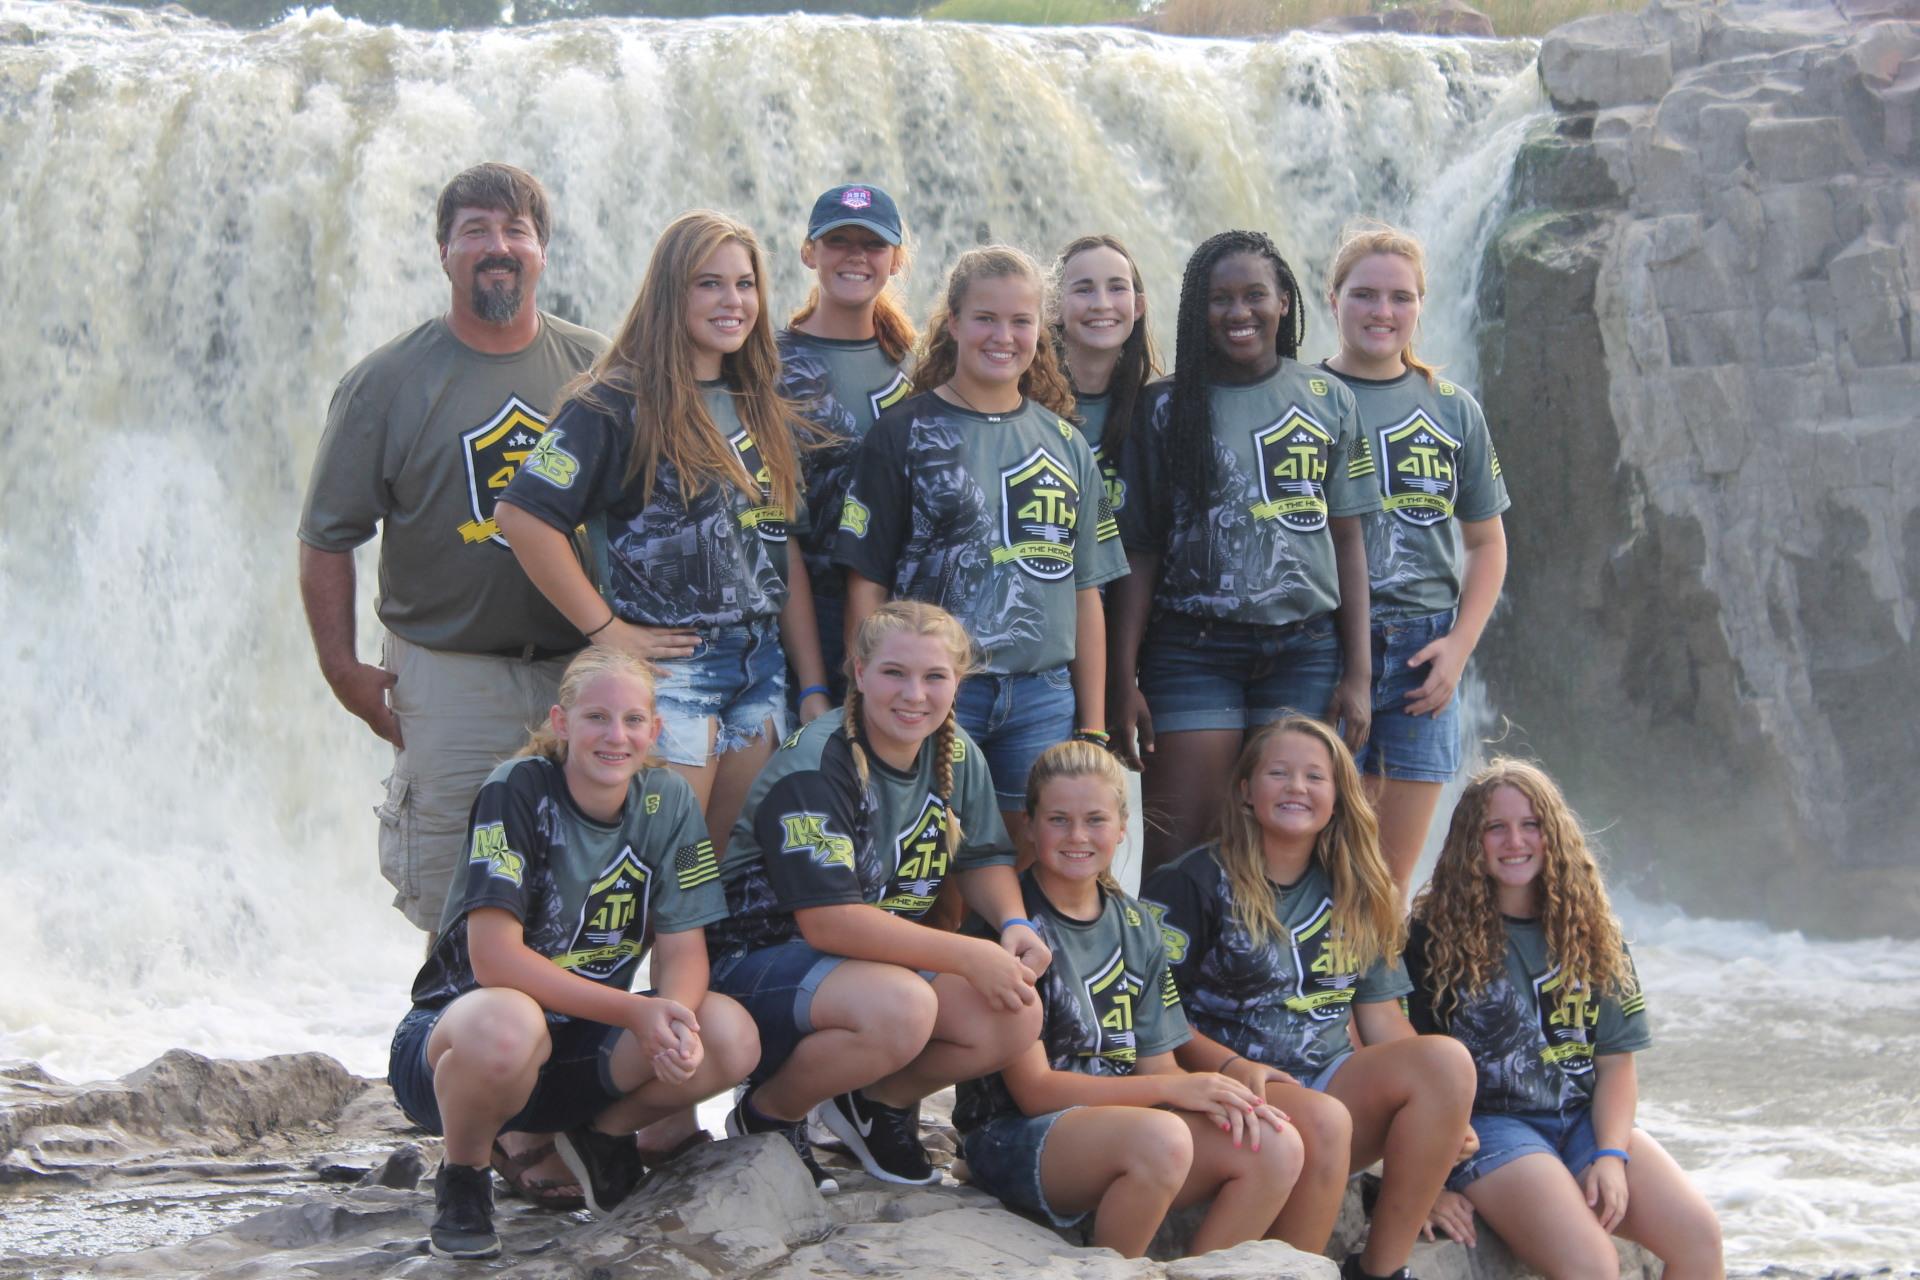 Team at Falls Park